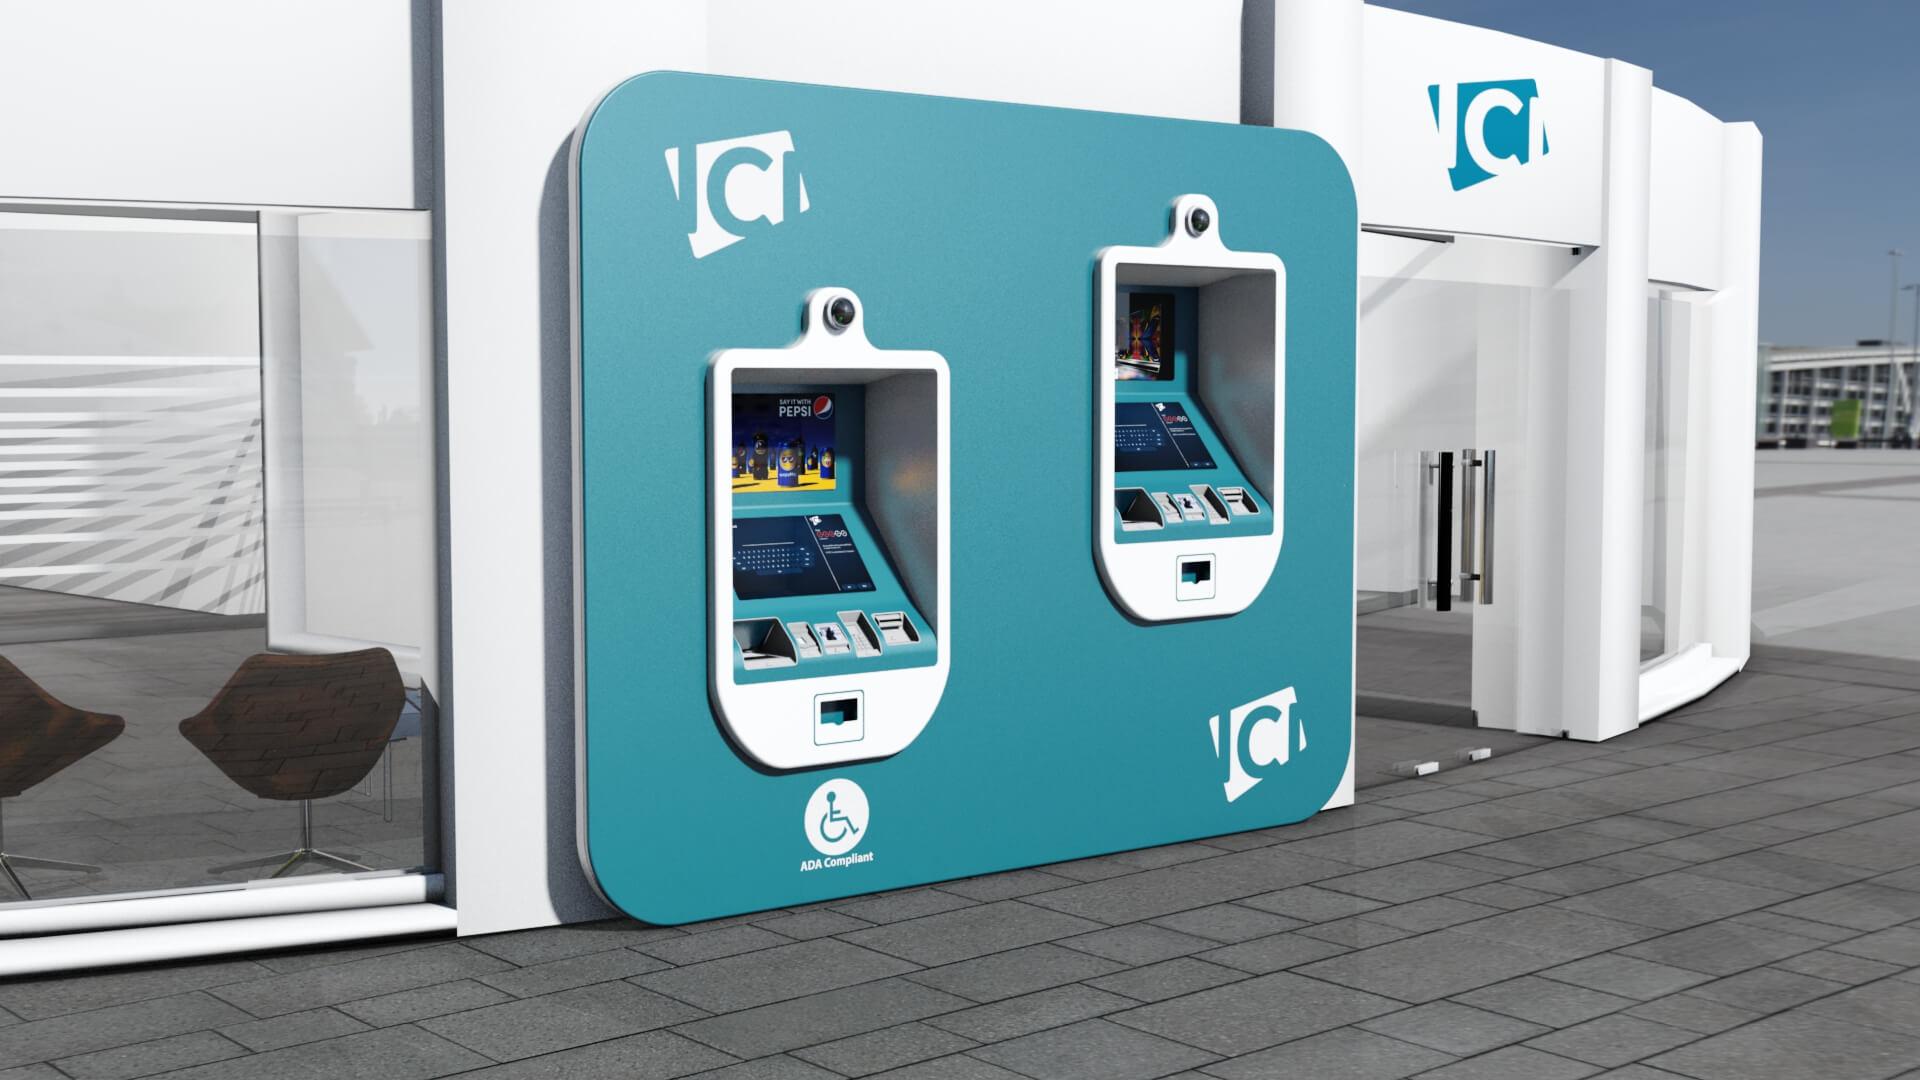 ICI Bank Wall Concept 1